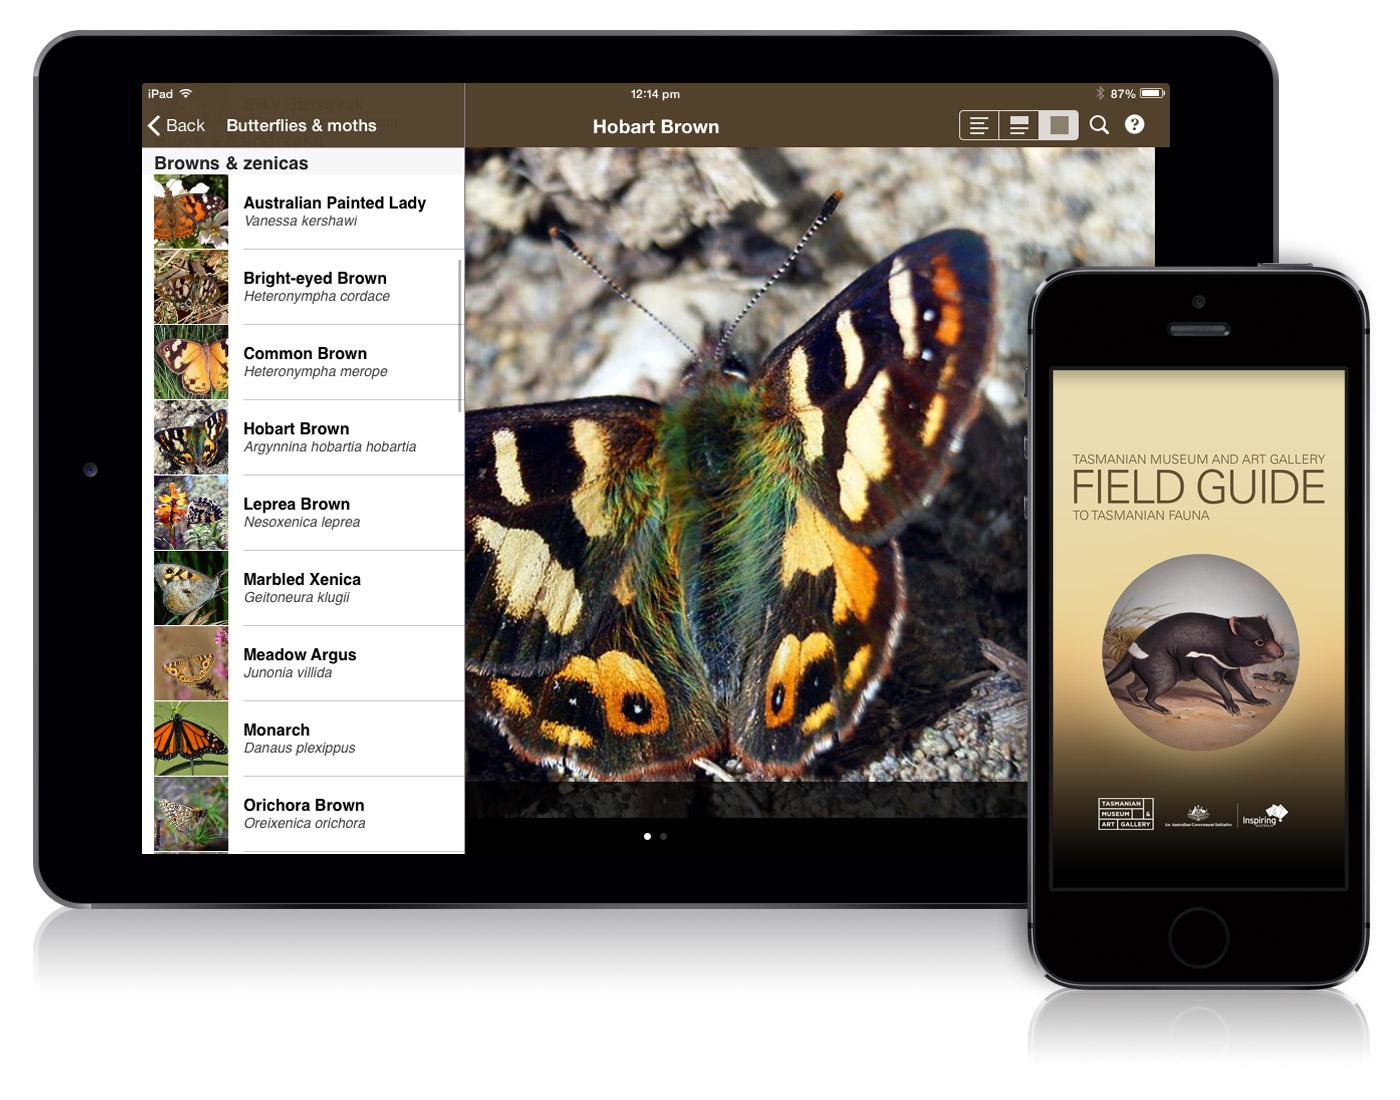 Field Guide to Tasmanian Fauna Book Cover